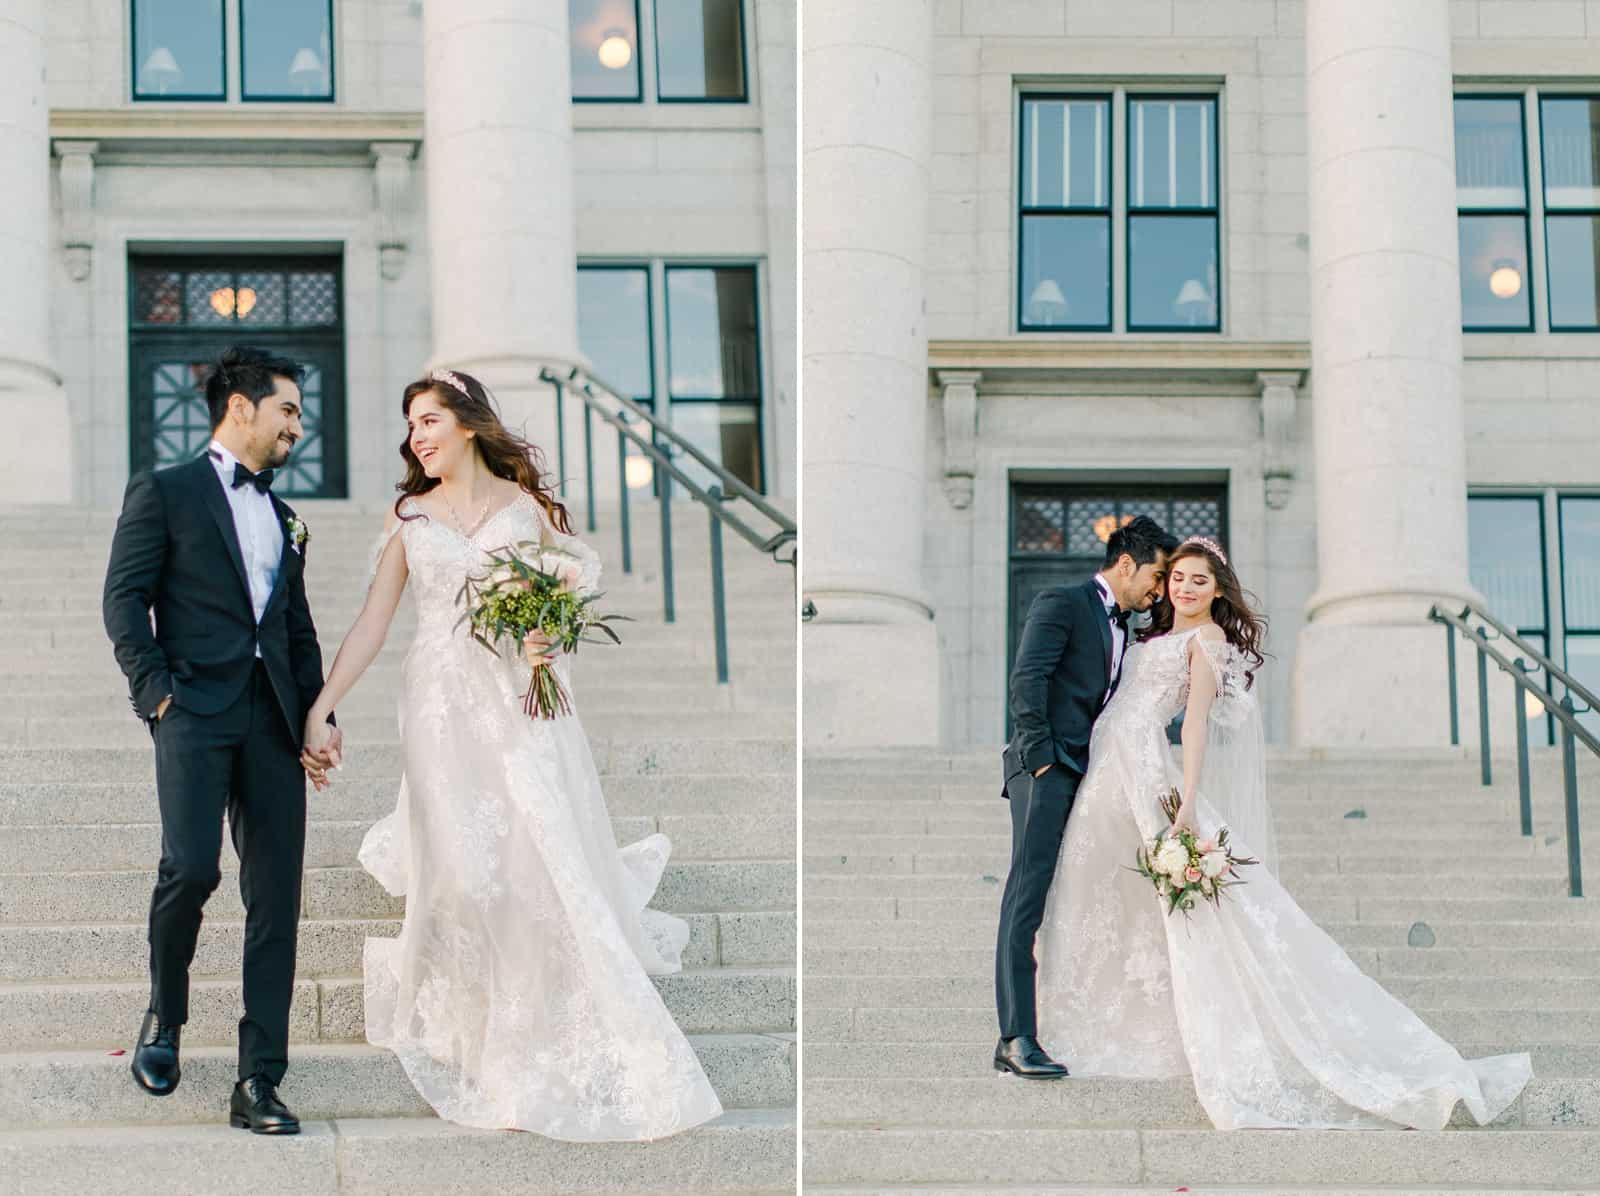 Palestinian Iranian Bride and Groom, Utah Wedding Photography at the Utah State Capitol, travel destination wedding photographer